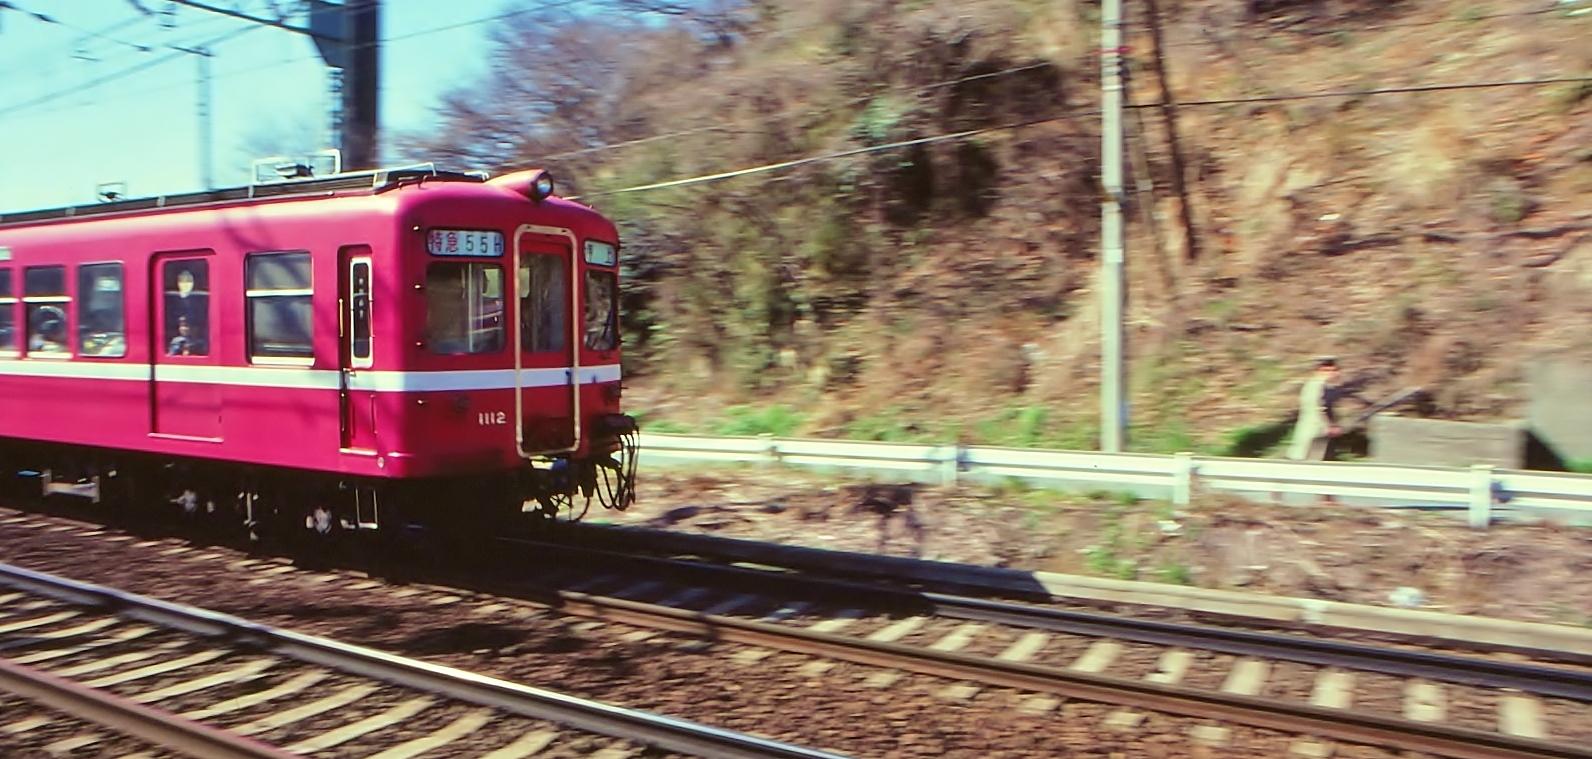 Japan Red Train